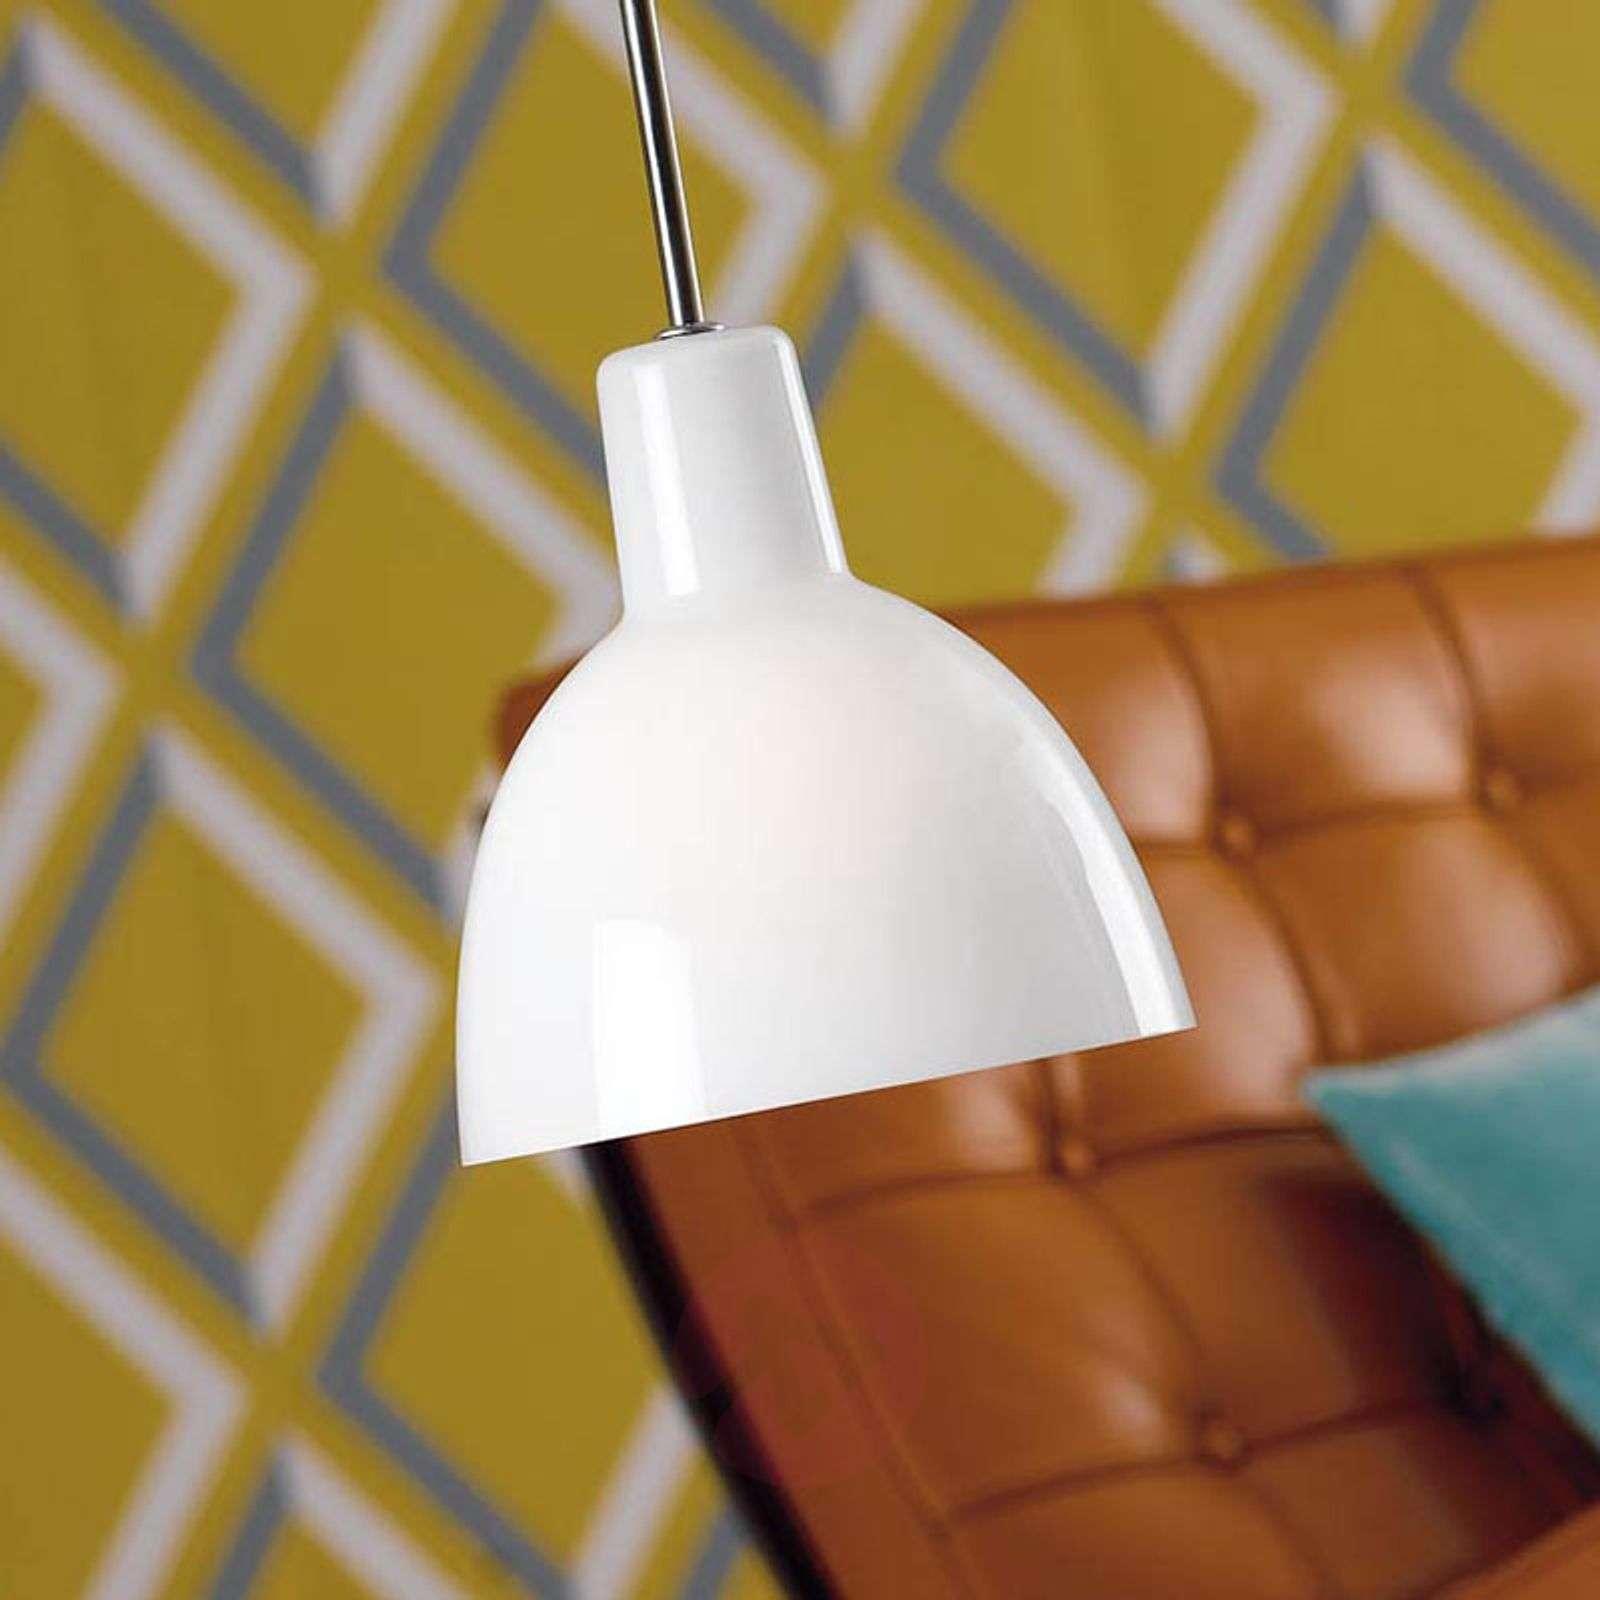 Louis Poulsen Toldbod hanging light 15.5 cm-6090059-01